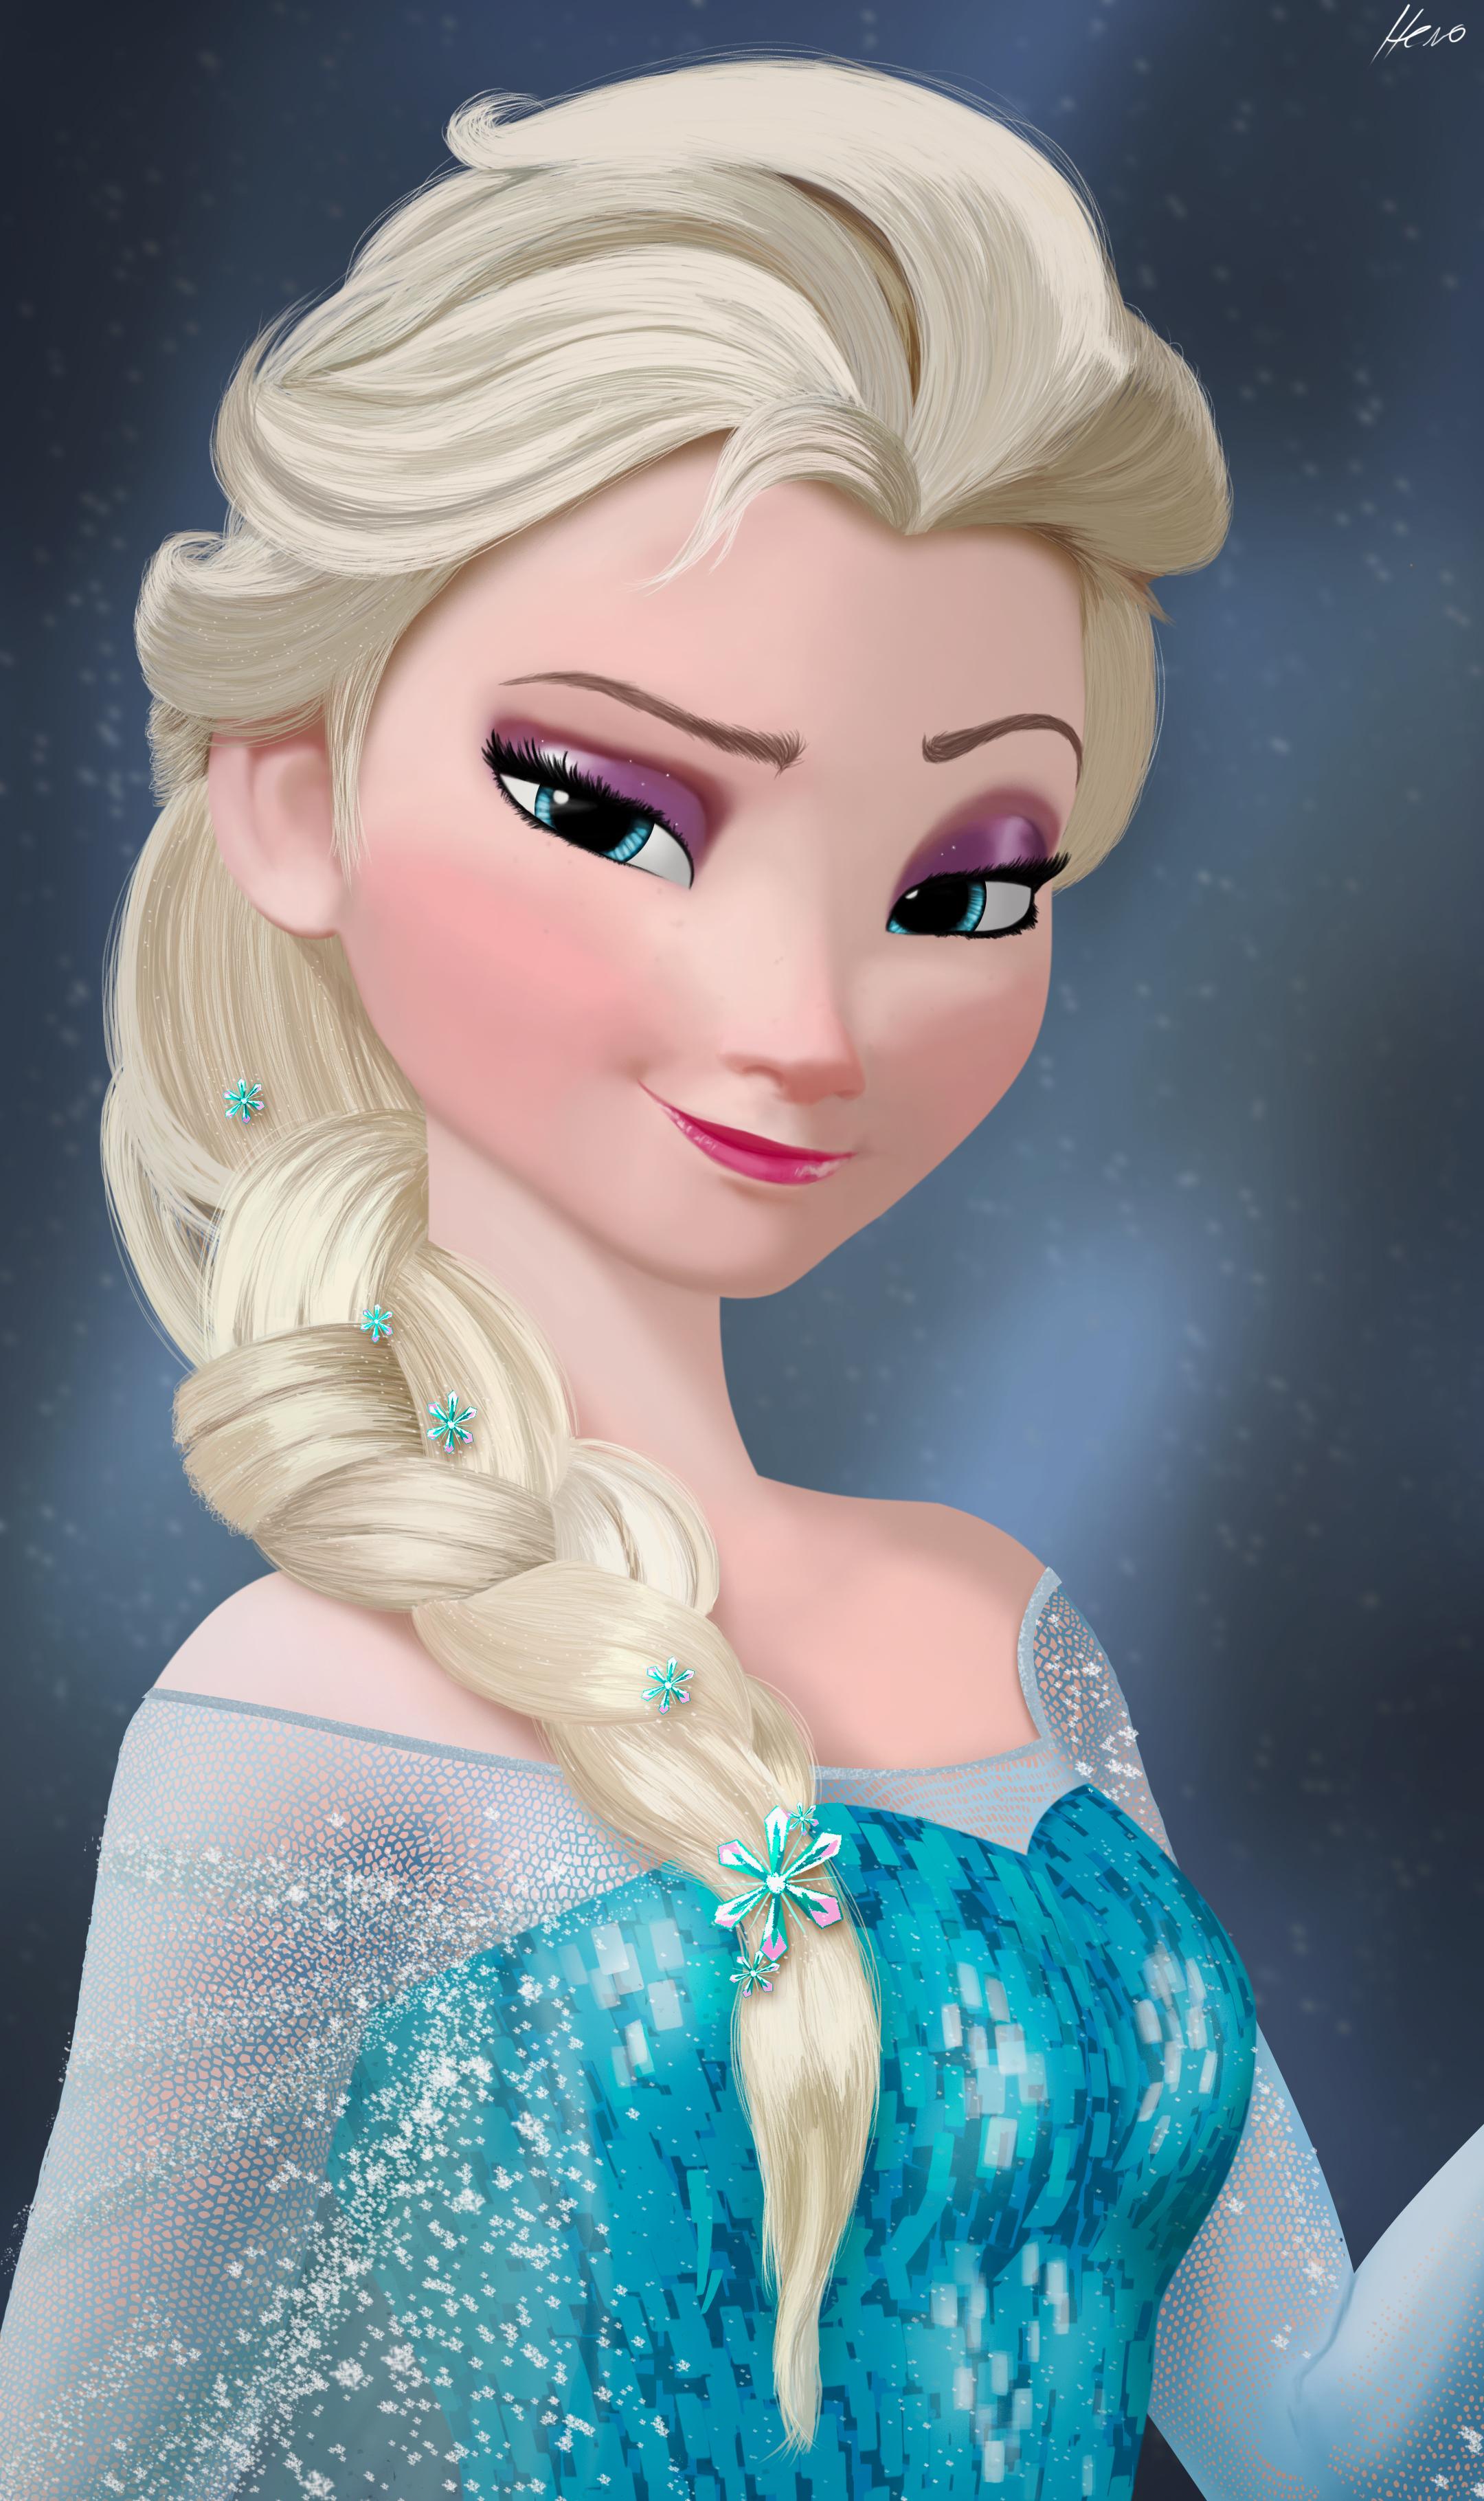 Elsa frozen by herostrain on deviantart elsa frozen by herostrain elsa frozen by herostrain voltagebd Choice Image